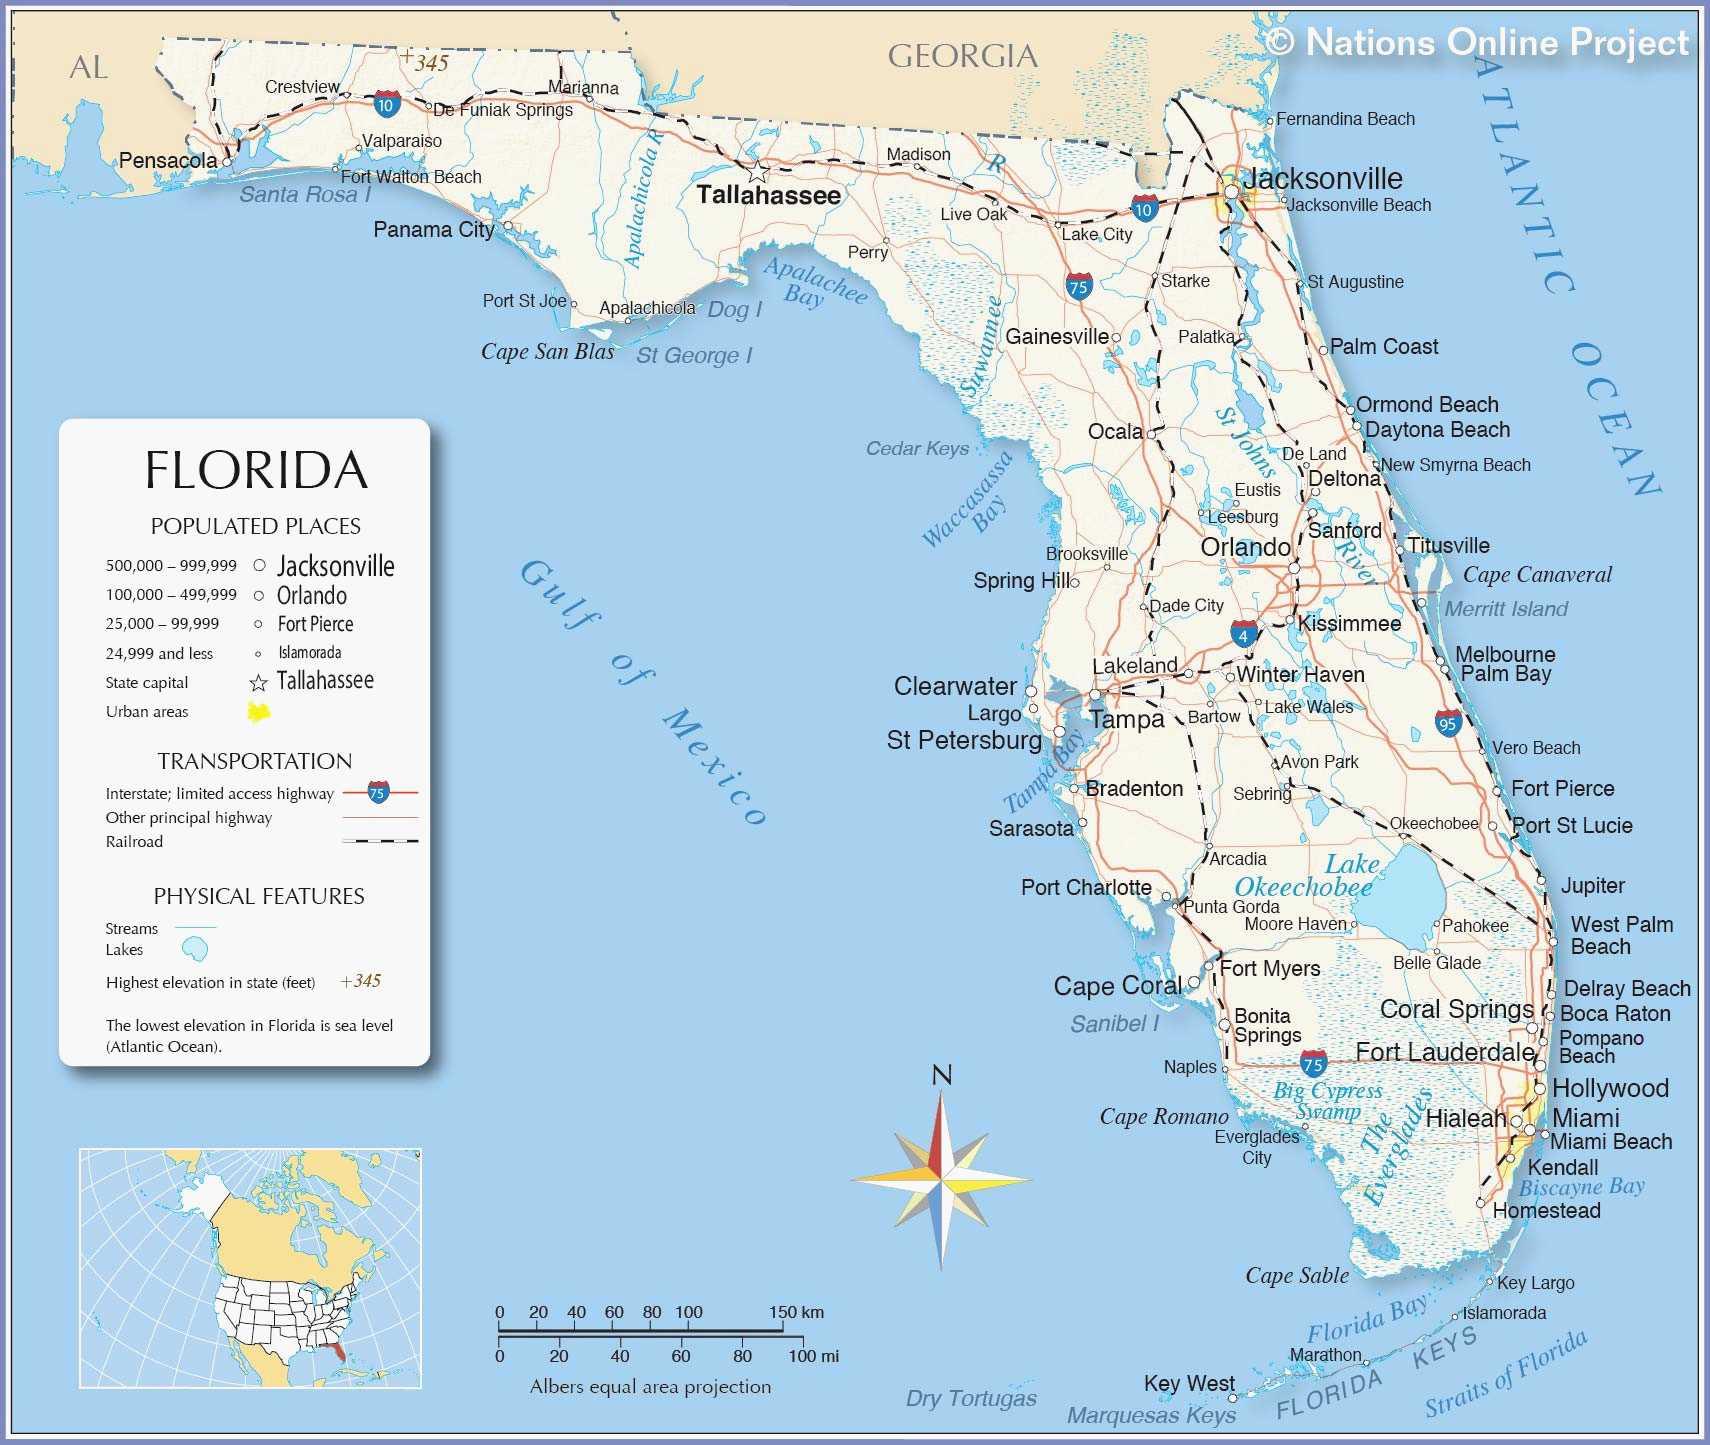 St George Island Florida Map - St George Island Florida Map